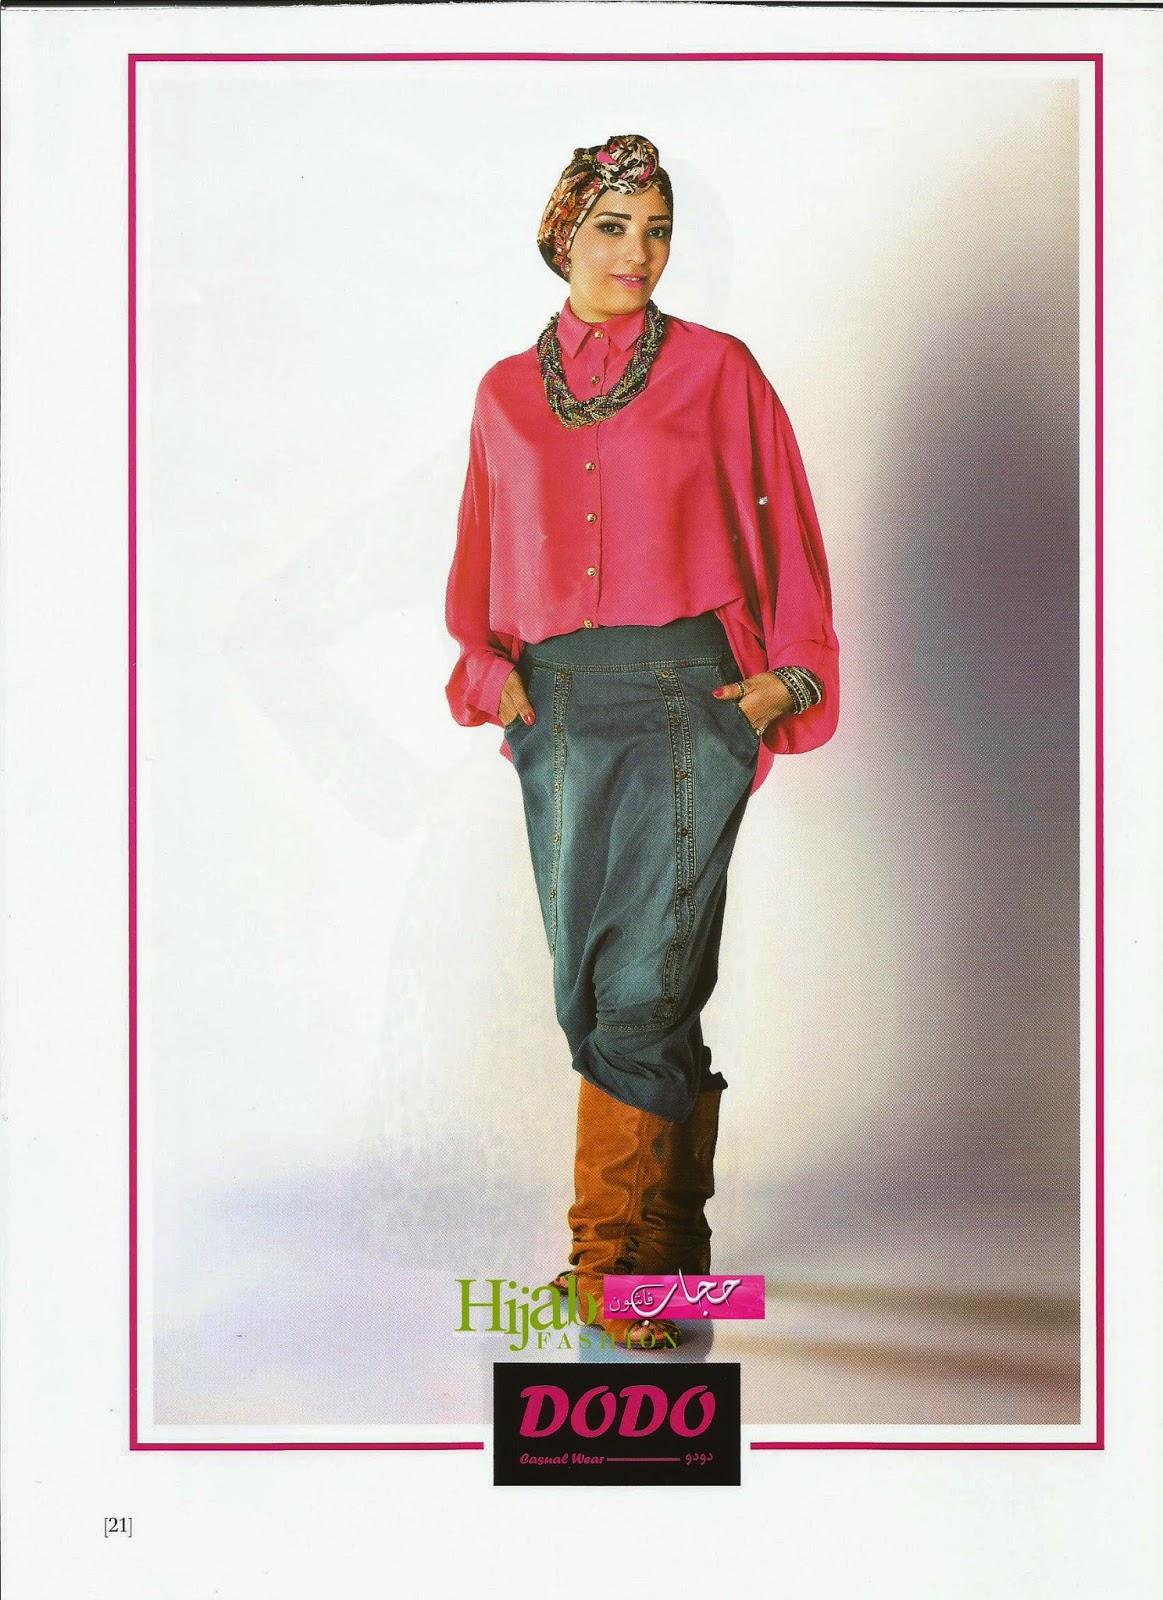 a7110ebab ربيع وصيف 2015 - أزياء دودو DODO - مجلة حجاب فاشون ابريل / مايو 2015